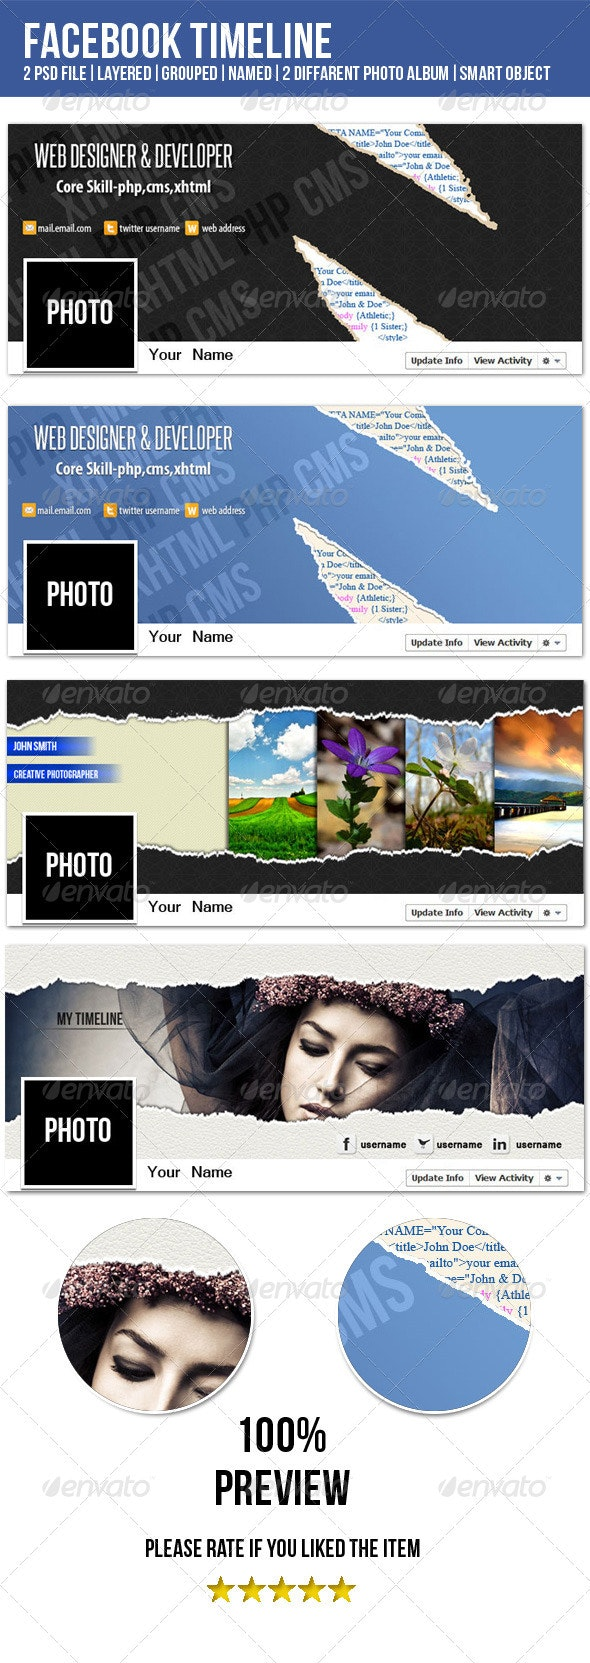 Tron FB Timeline Cover Image - Facebook Timeline Covers Social Media